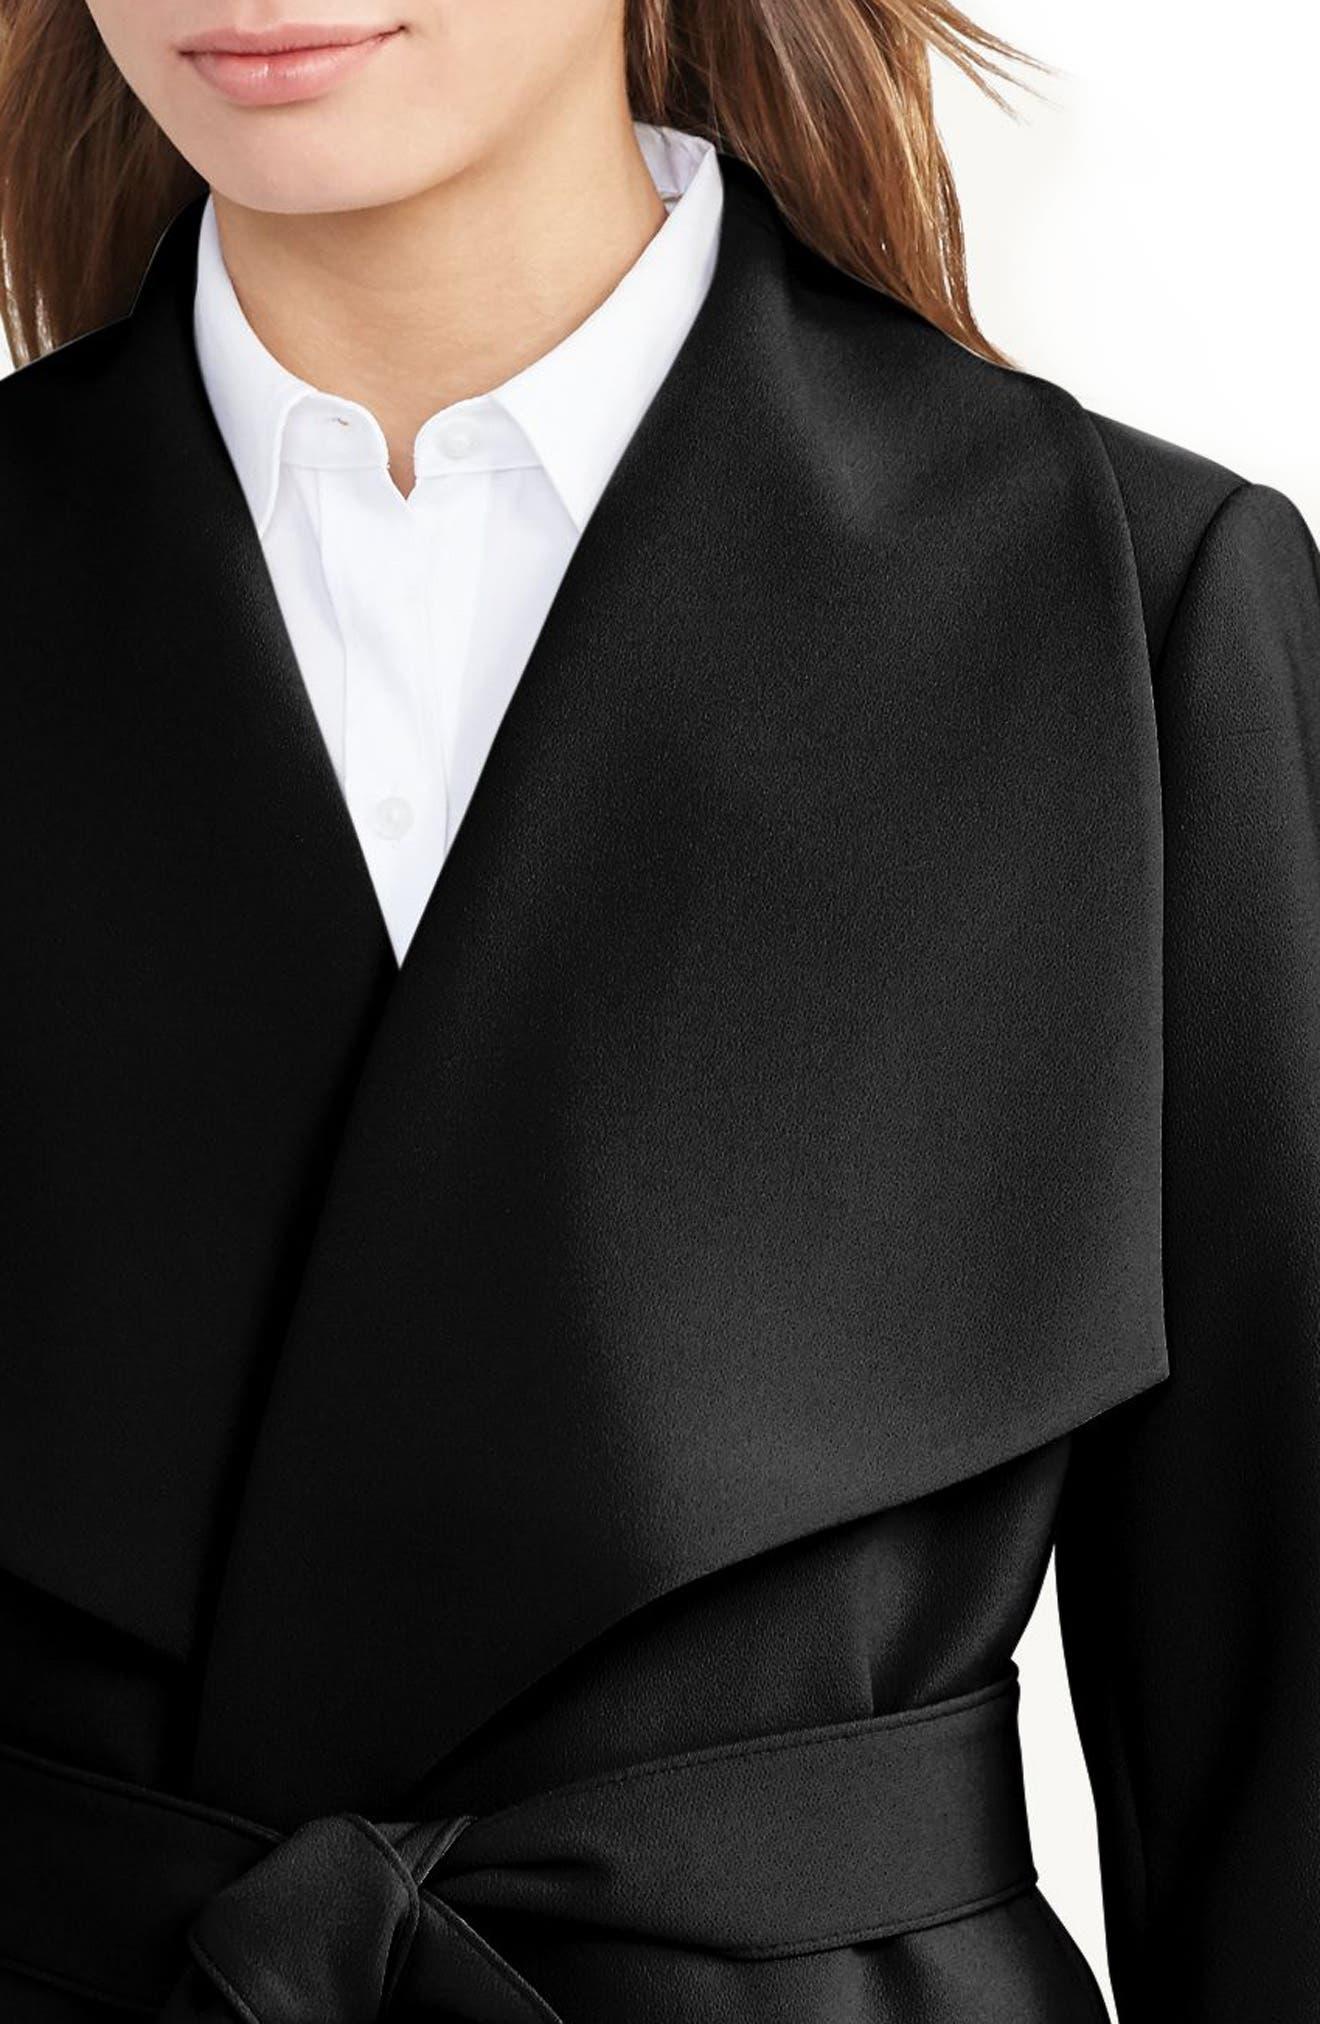 LAUREN RALPH LAUREN, Belted Drape Front Coat, Alternate thumbnail 4, color, 002